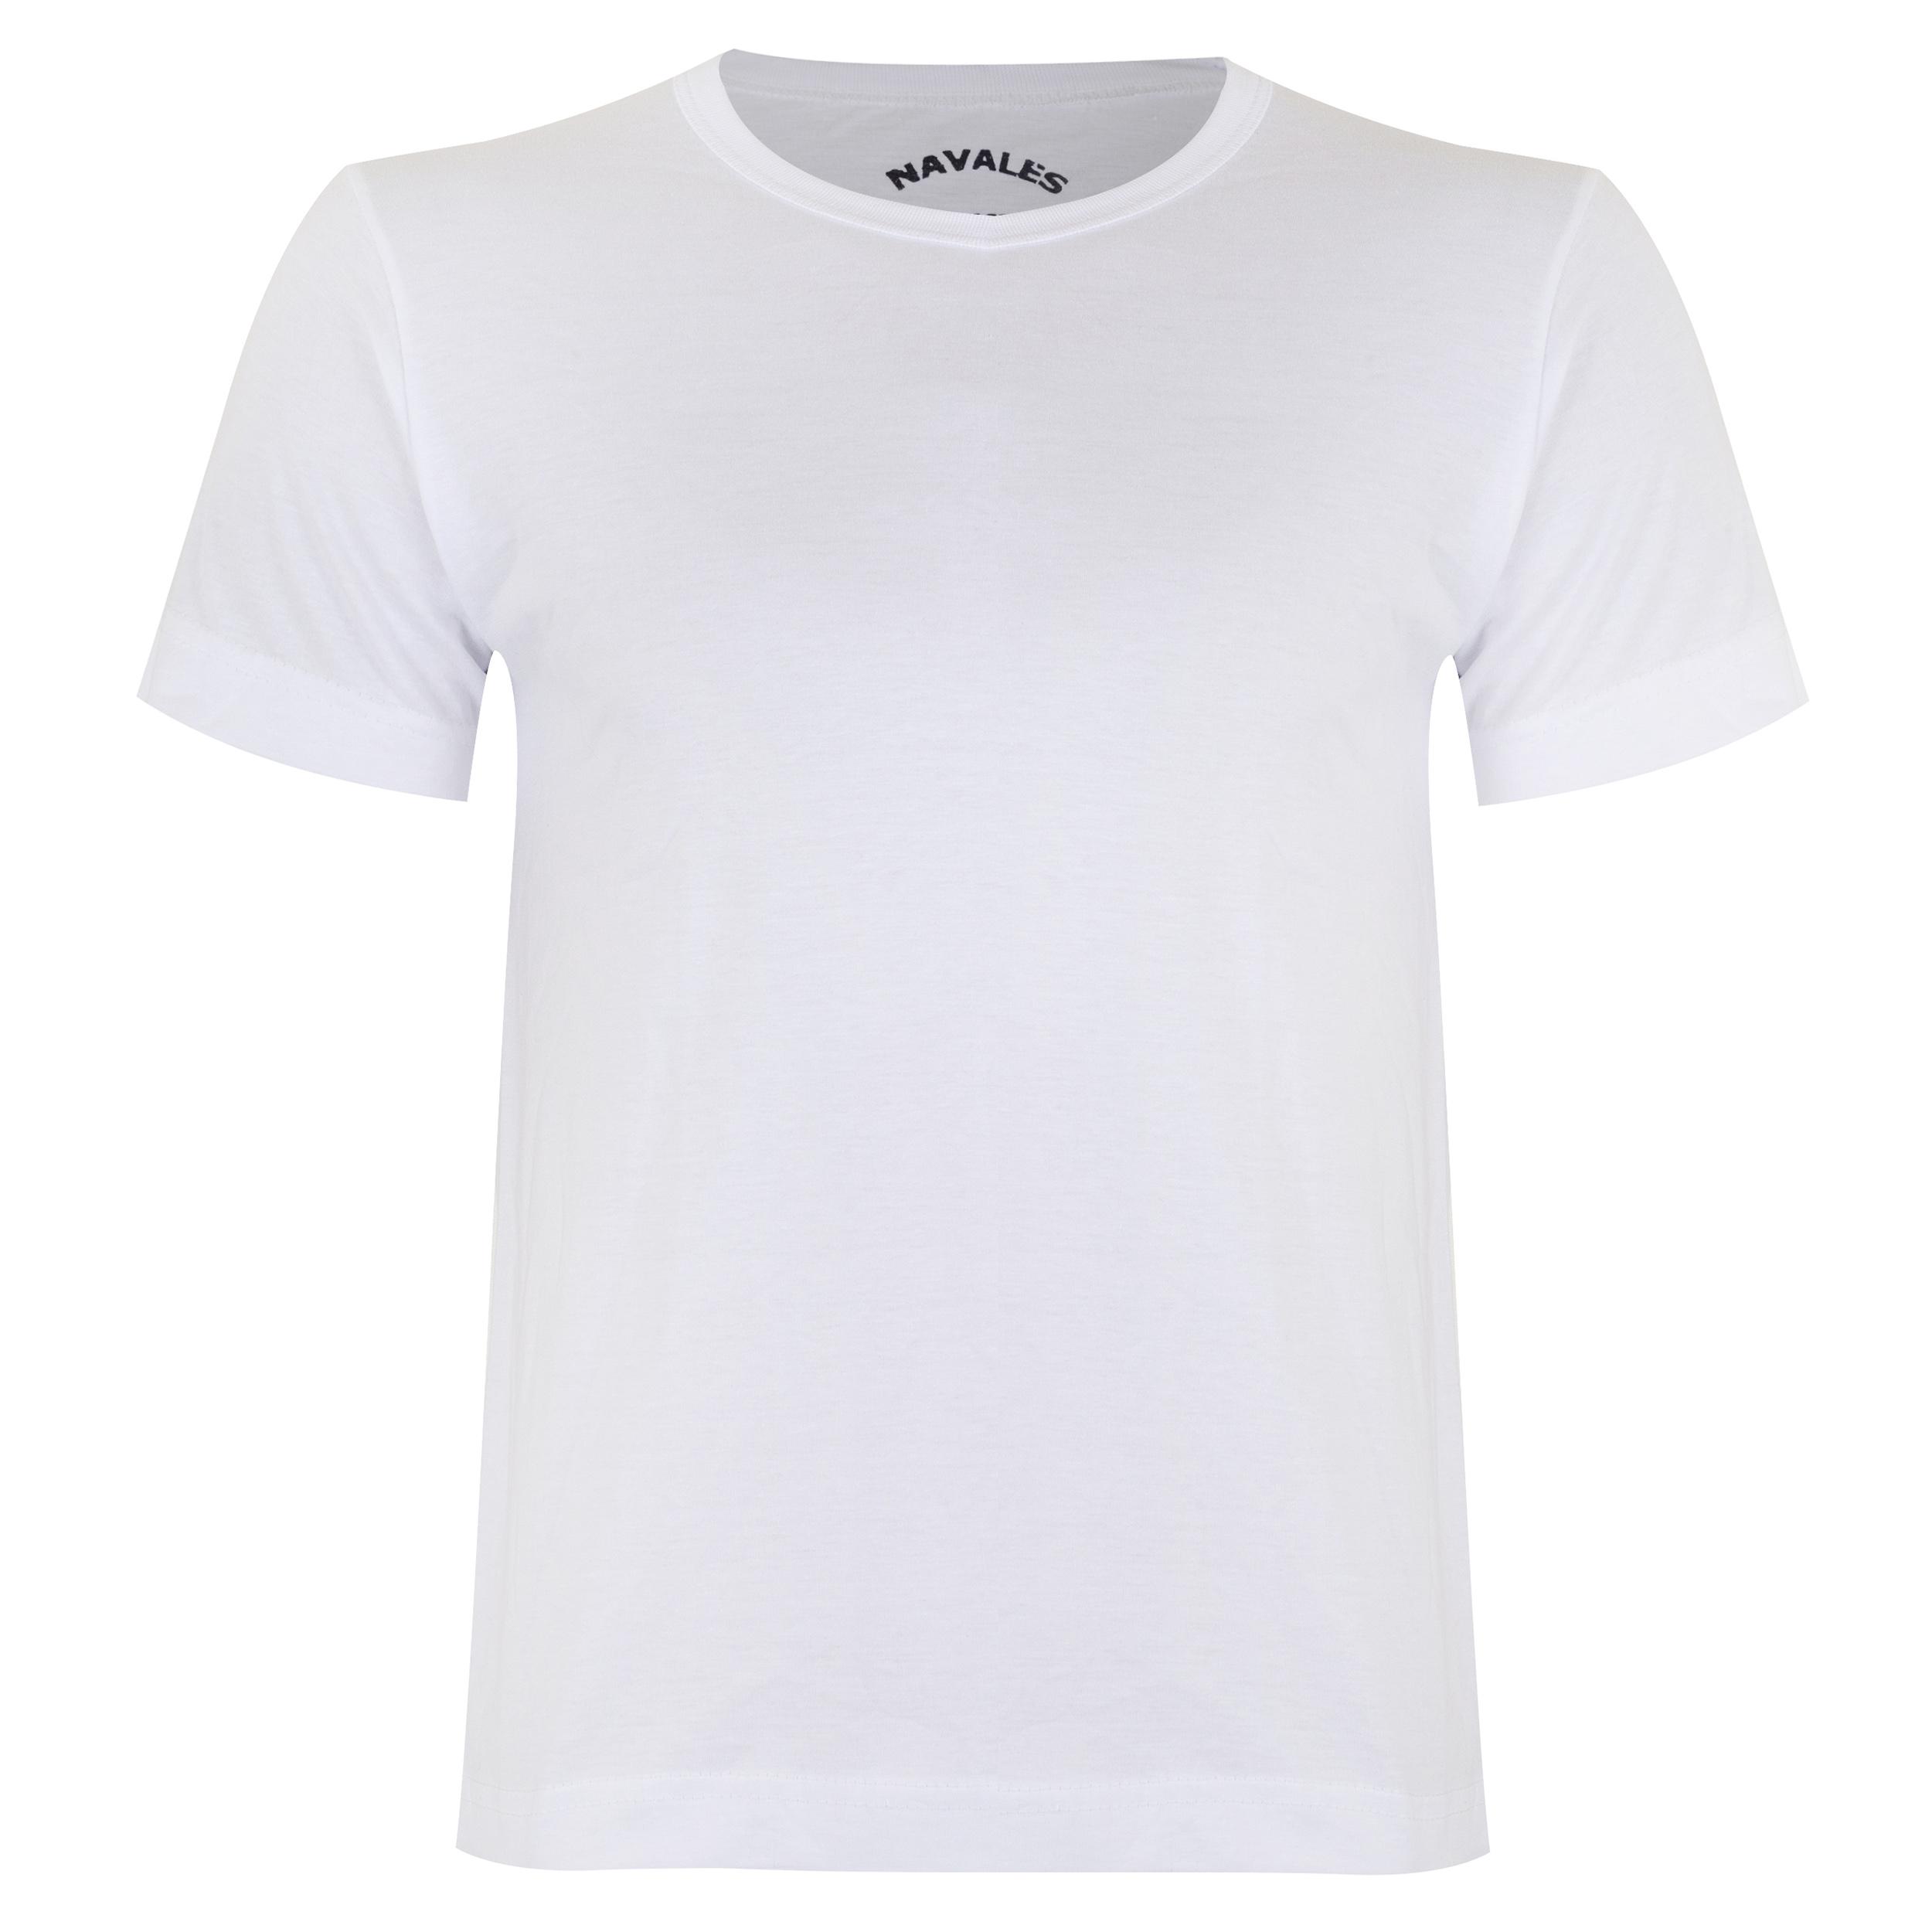 تیشرت مردانه سایز بزرگ ناوالس مدل simple colors03